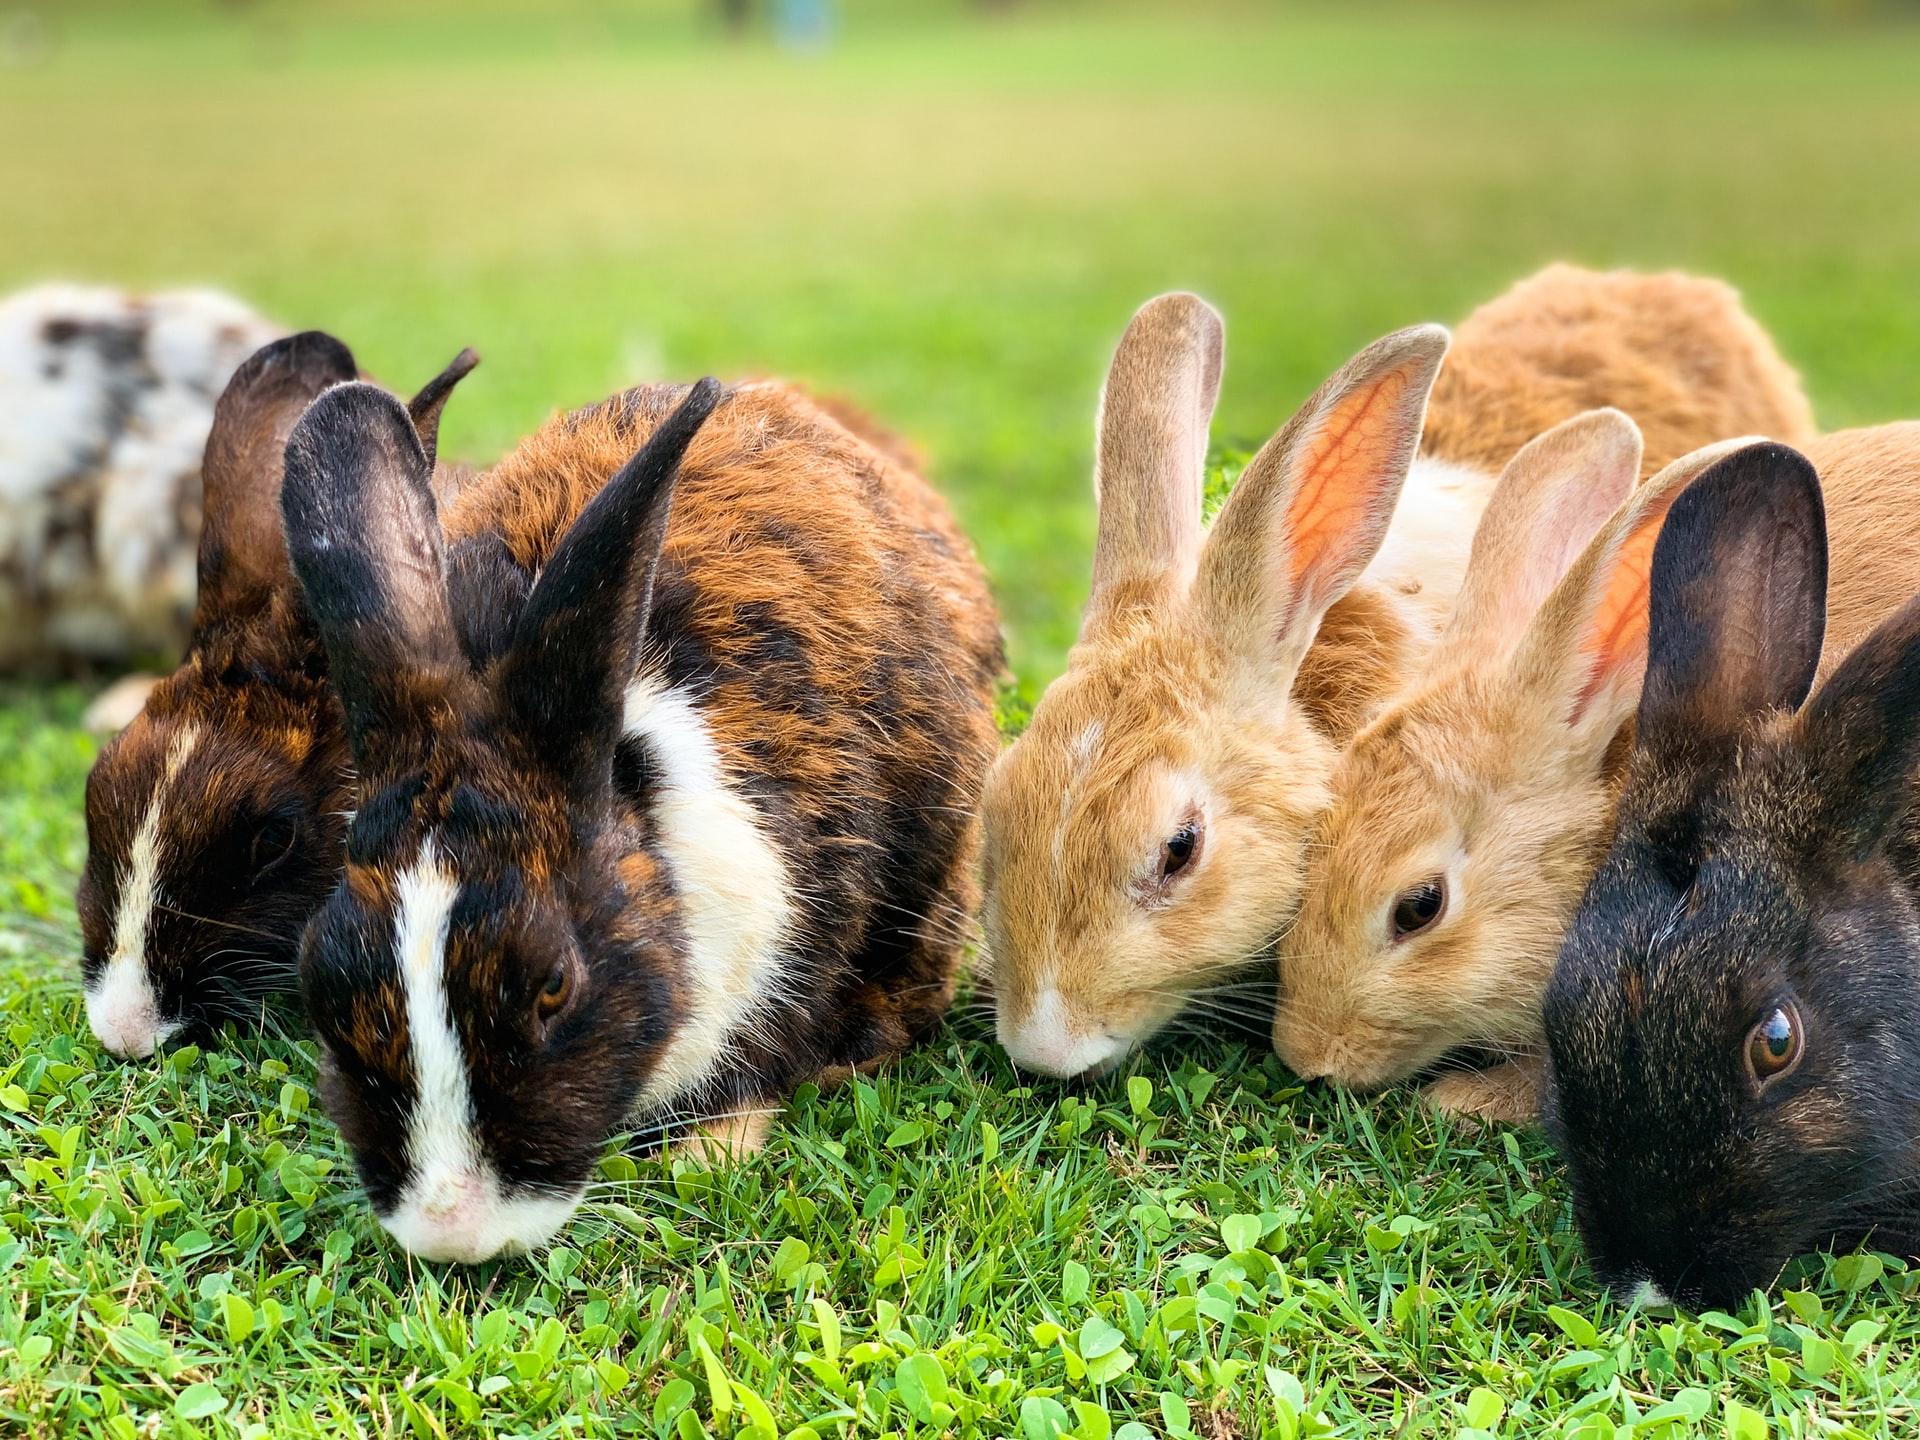 Hazards to rabbits in the wild